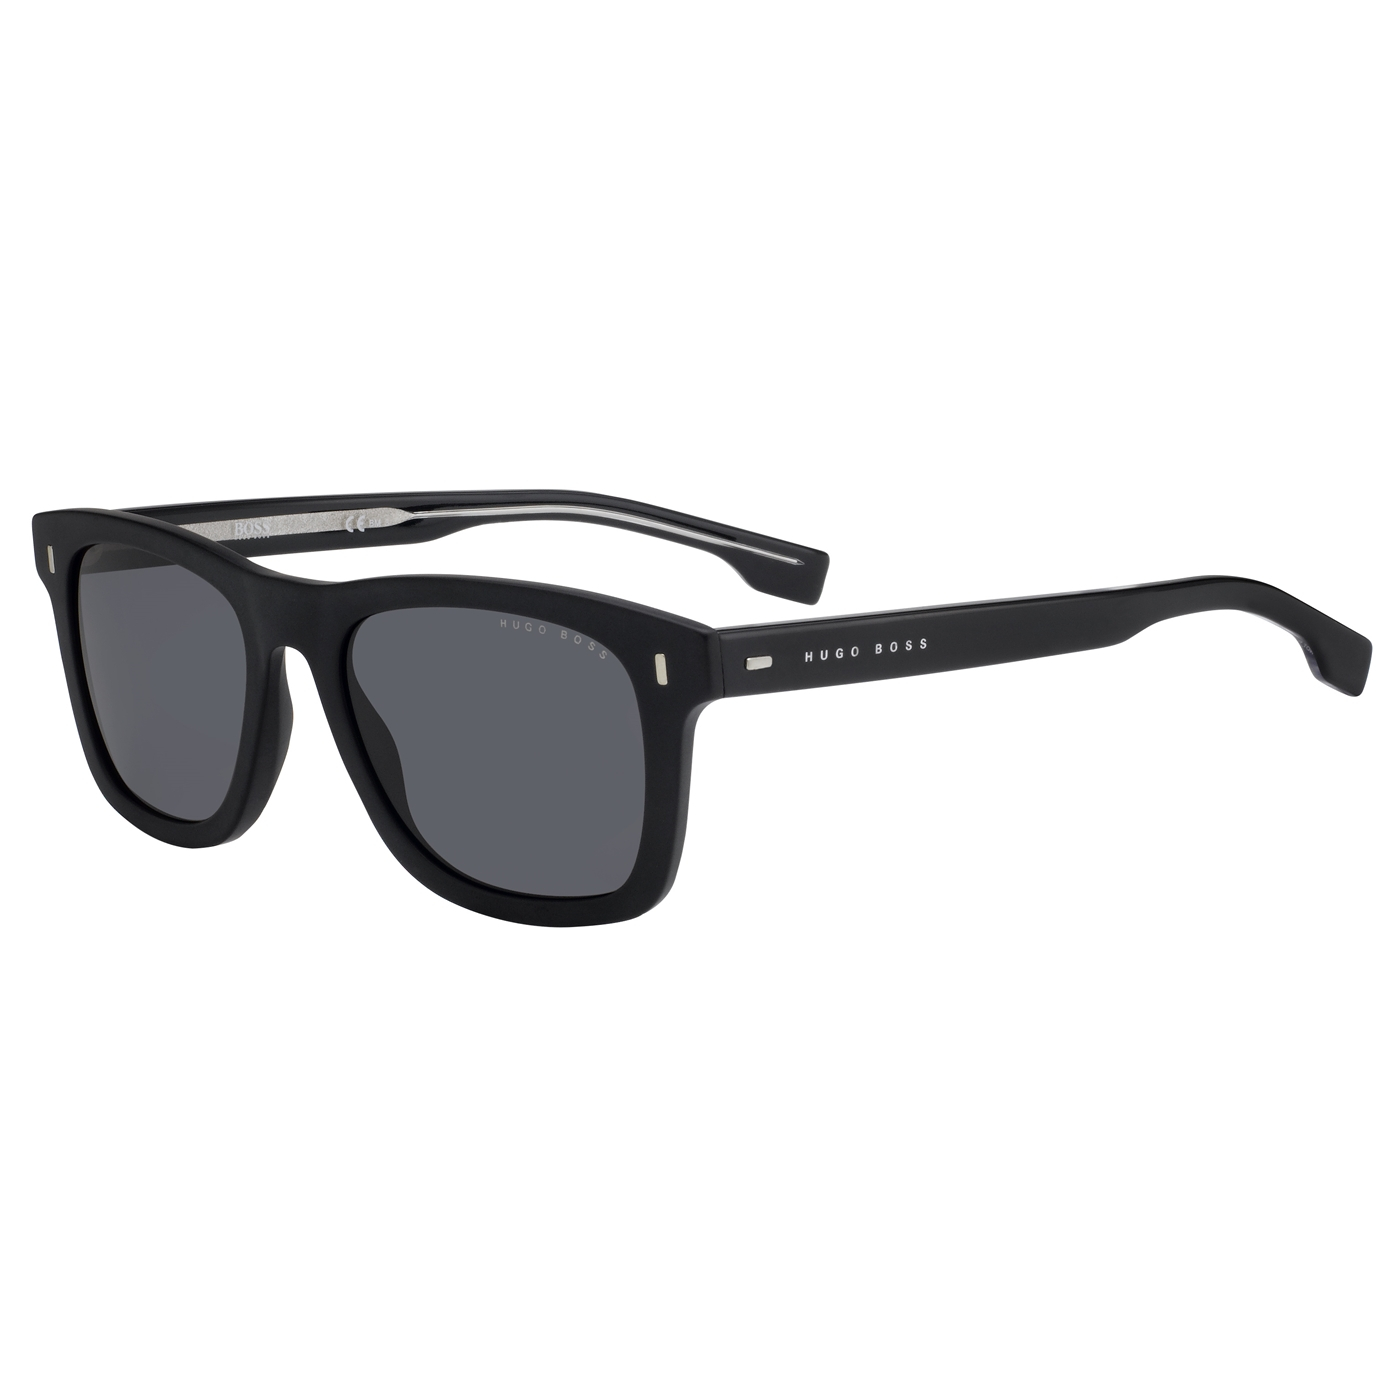 Bilde av Boss Black Sunglasses BOSS 0925S 807 52 IR